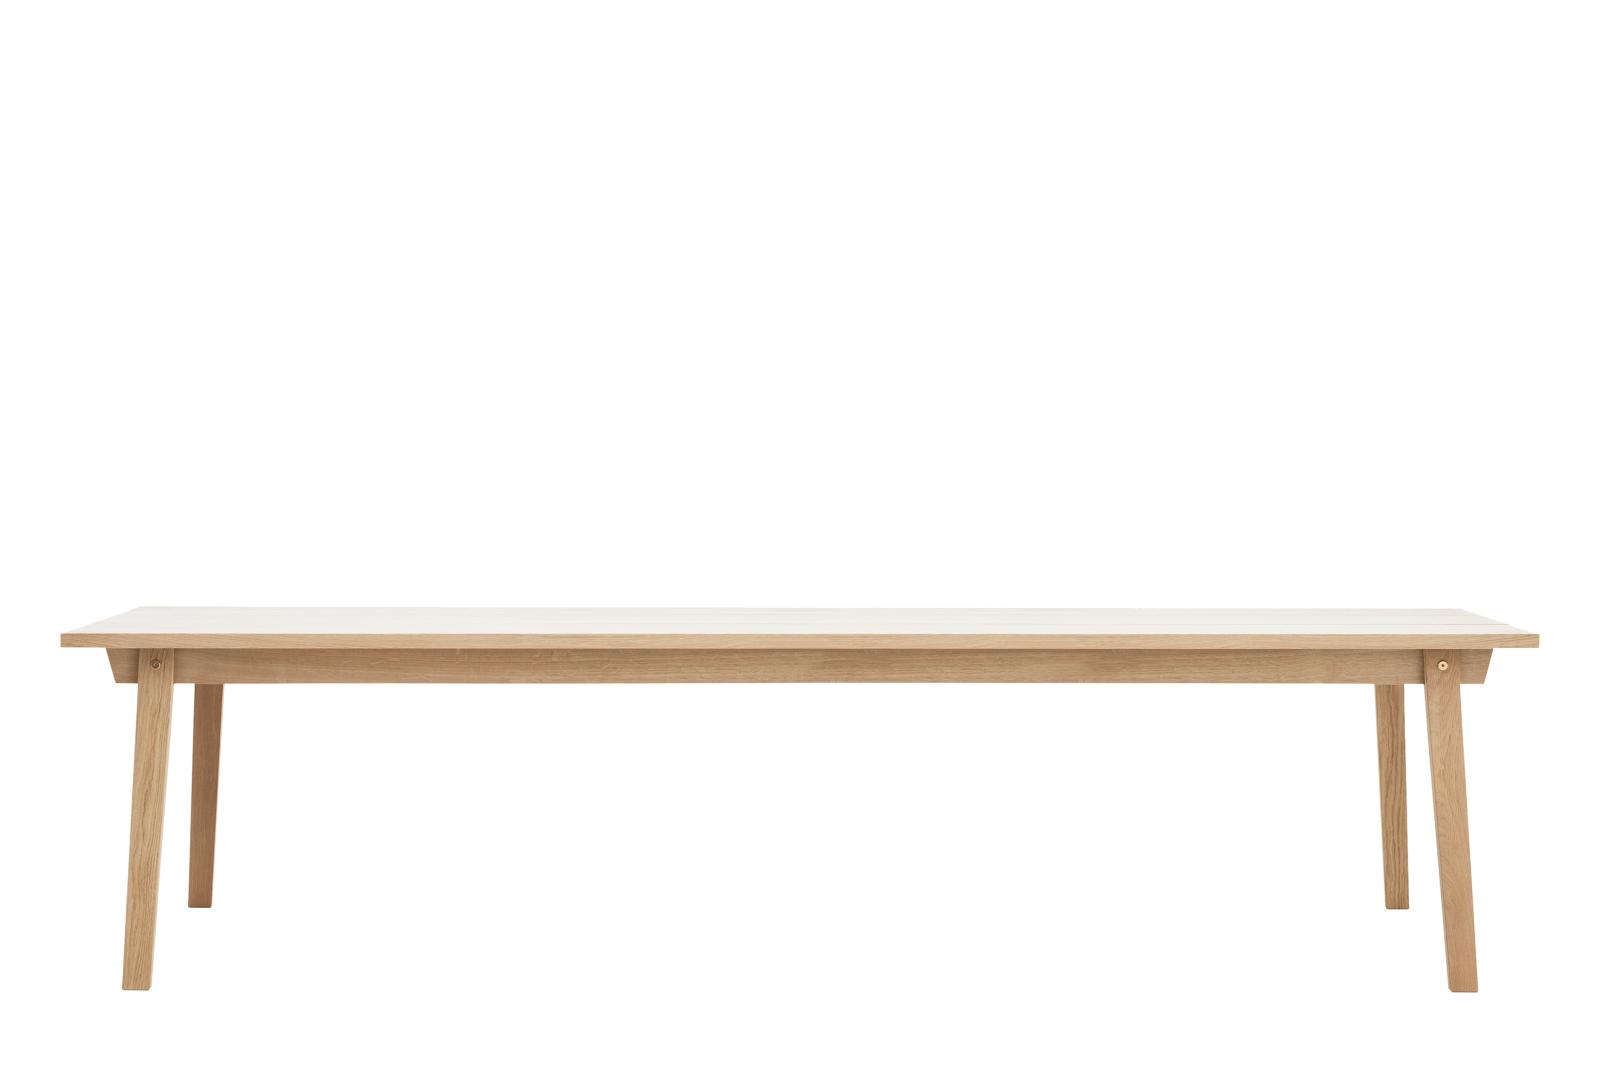 Slice Dining Table - Rectangular NC Oak, 90 x 300 cm